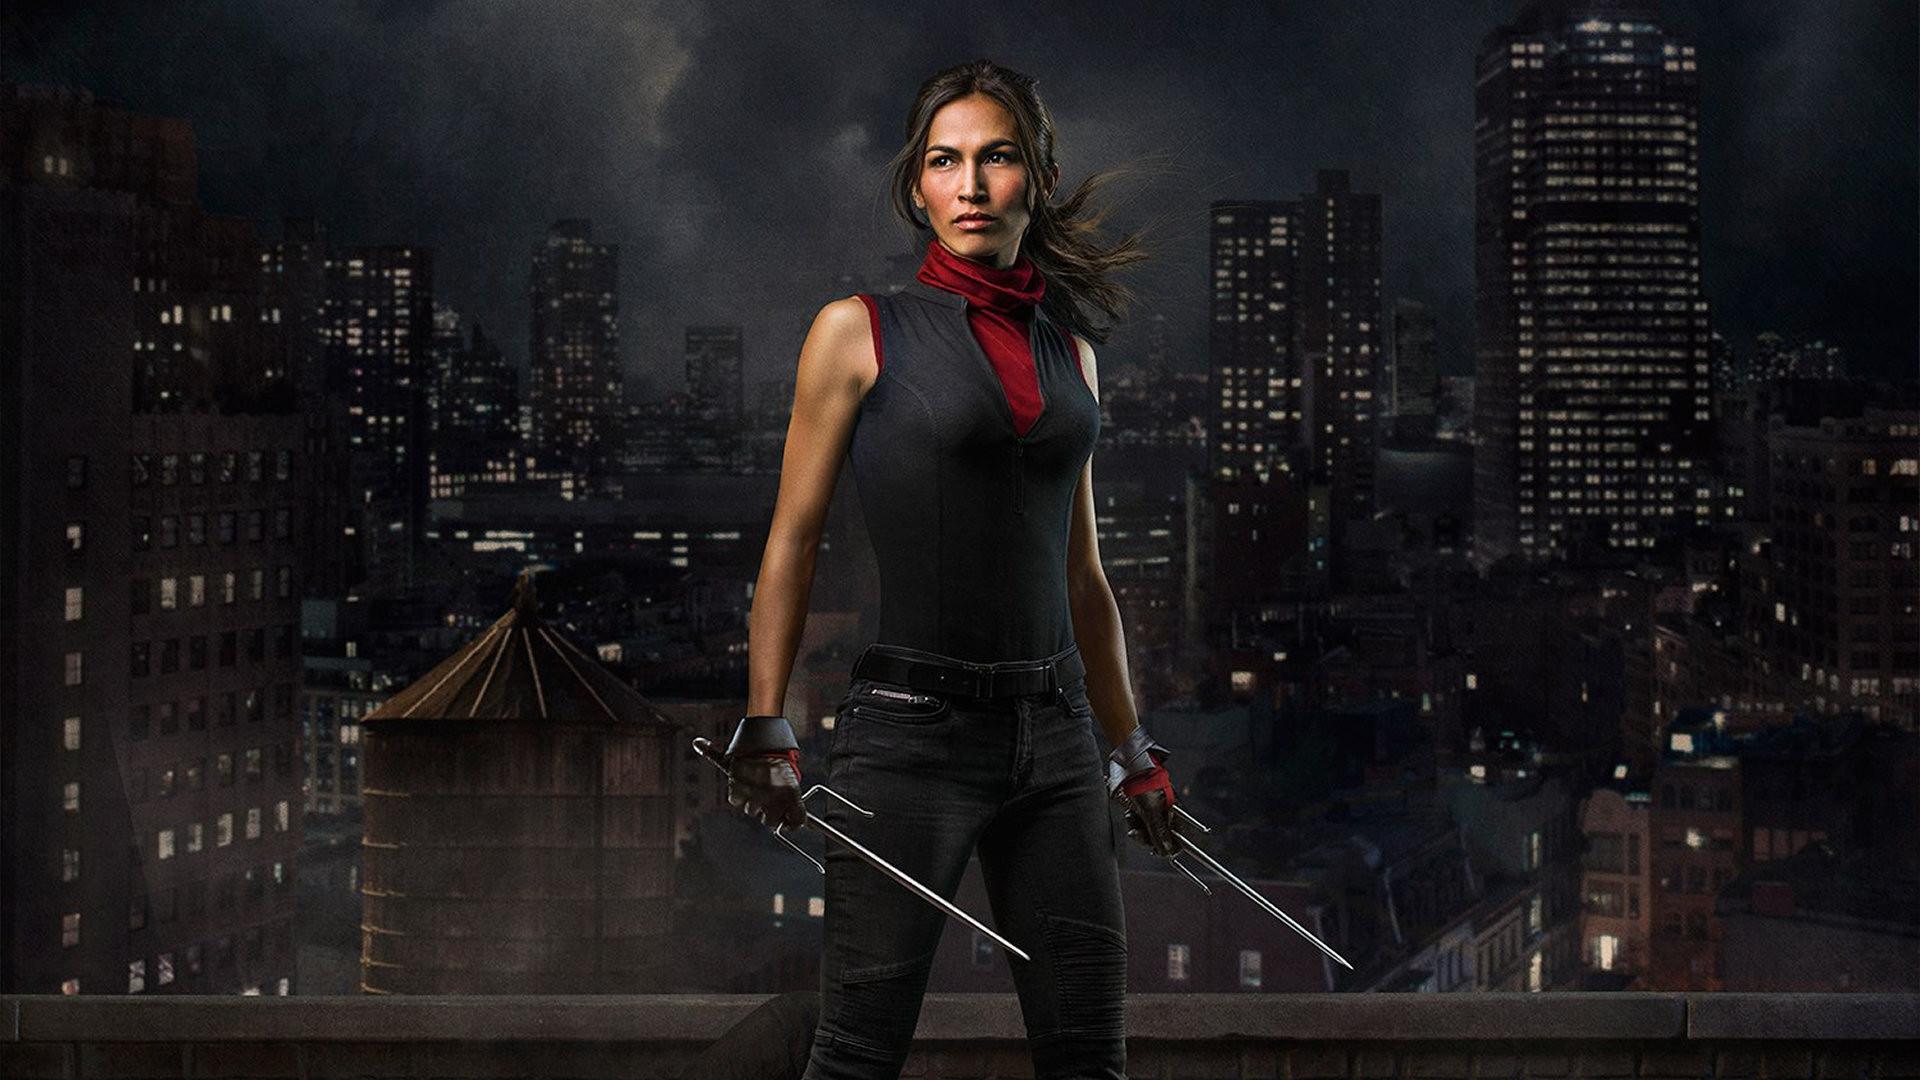 TV Show – Daredevil Elektra Elektra Natchios Elodie Yung Wallpaper